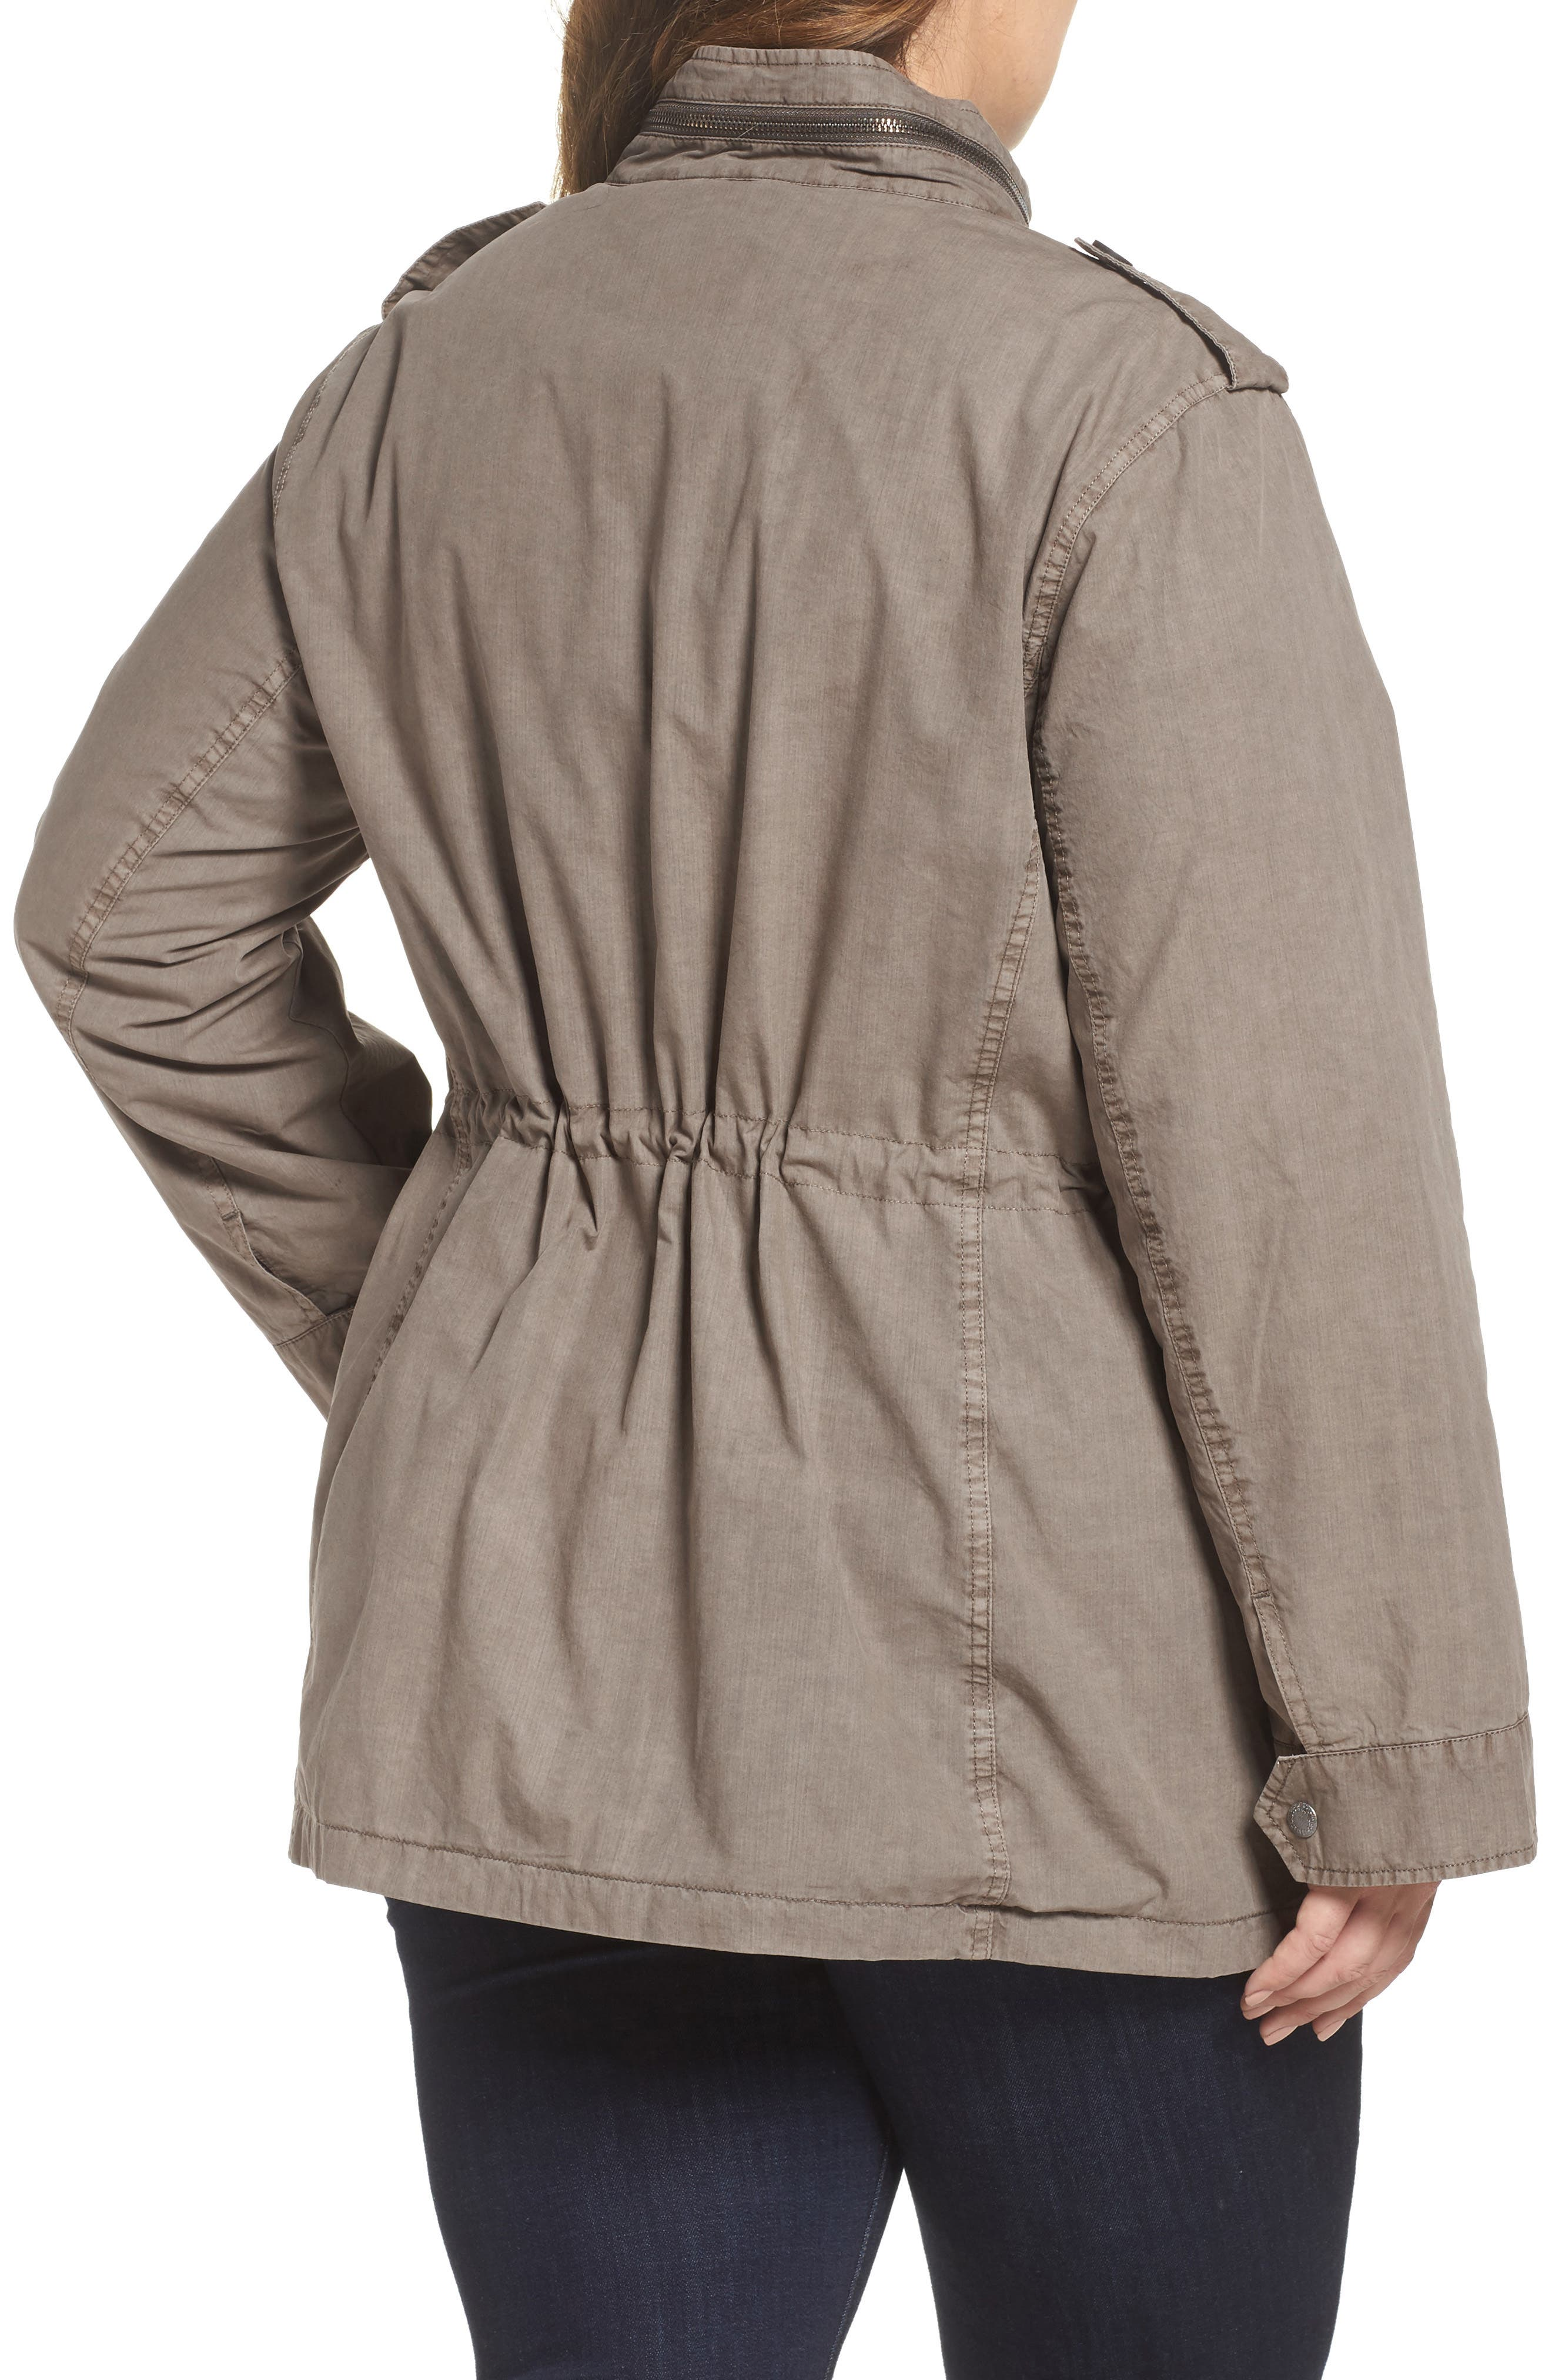 Cotton Military Jacket,                             Alternate thumbnail 2, color,                             033